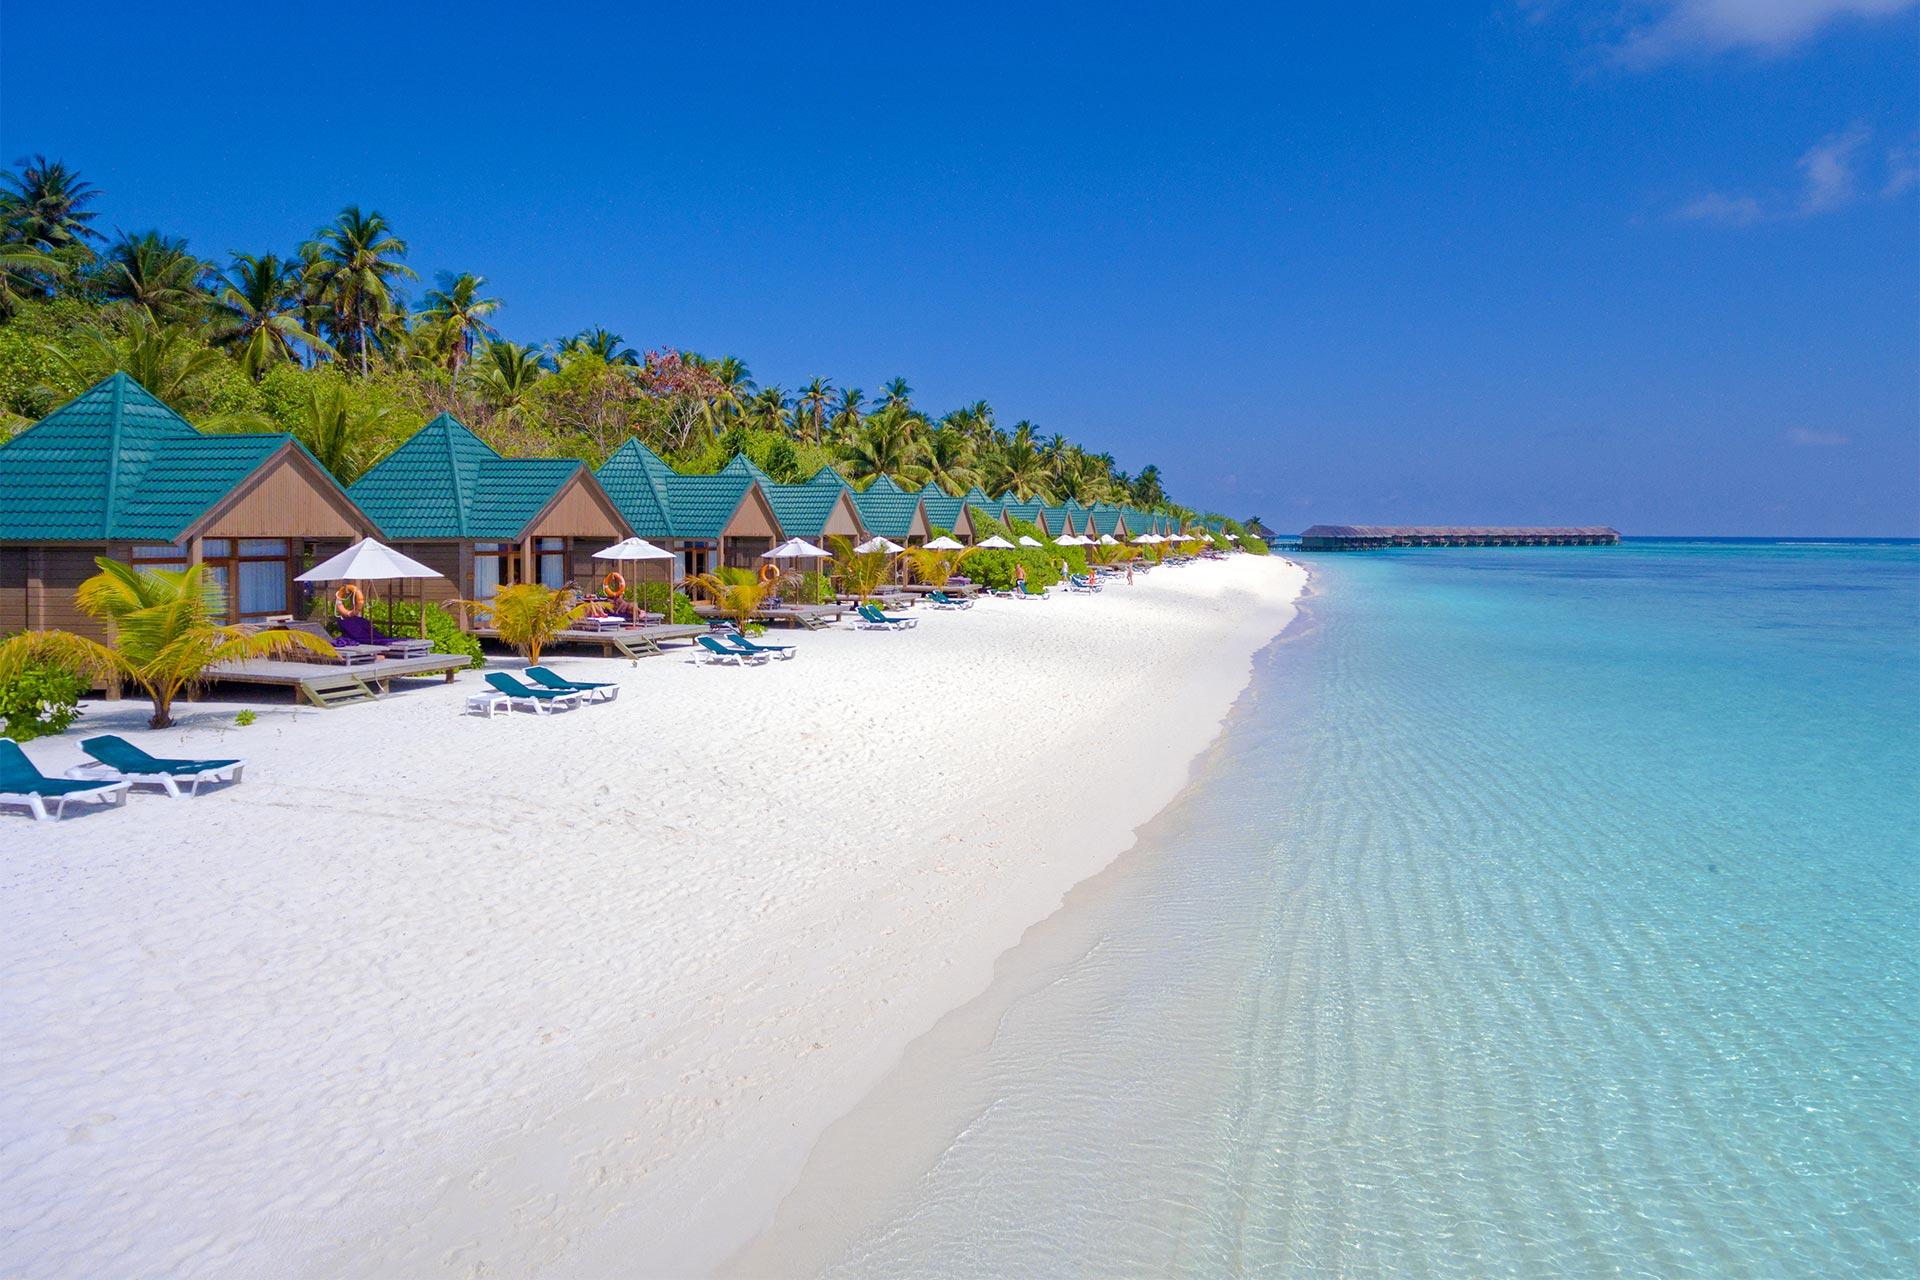 Luna de miere - Sejur plaja Meeru Island Resort & Spa Maldives, 8 zile